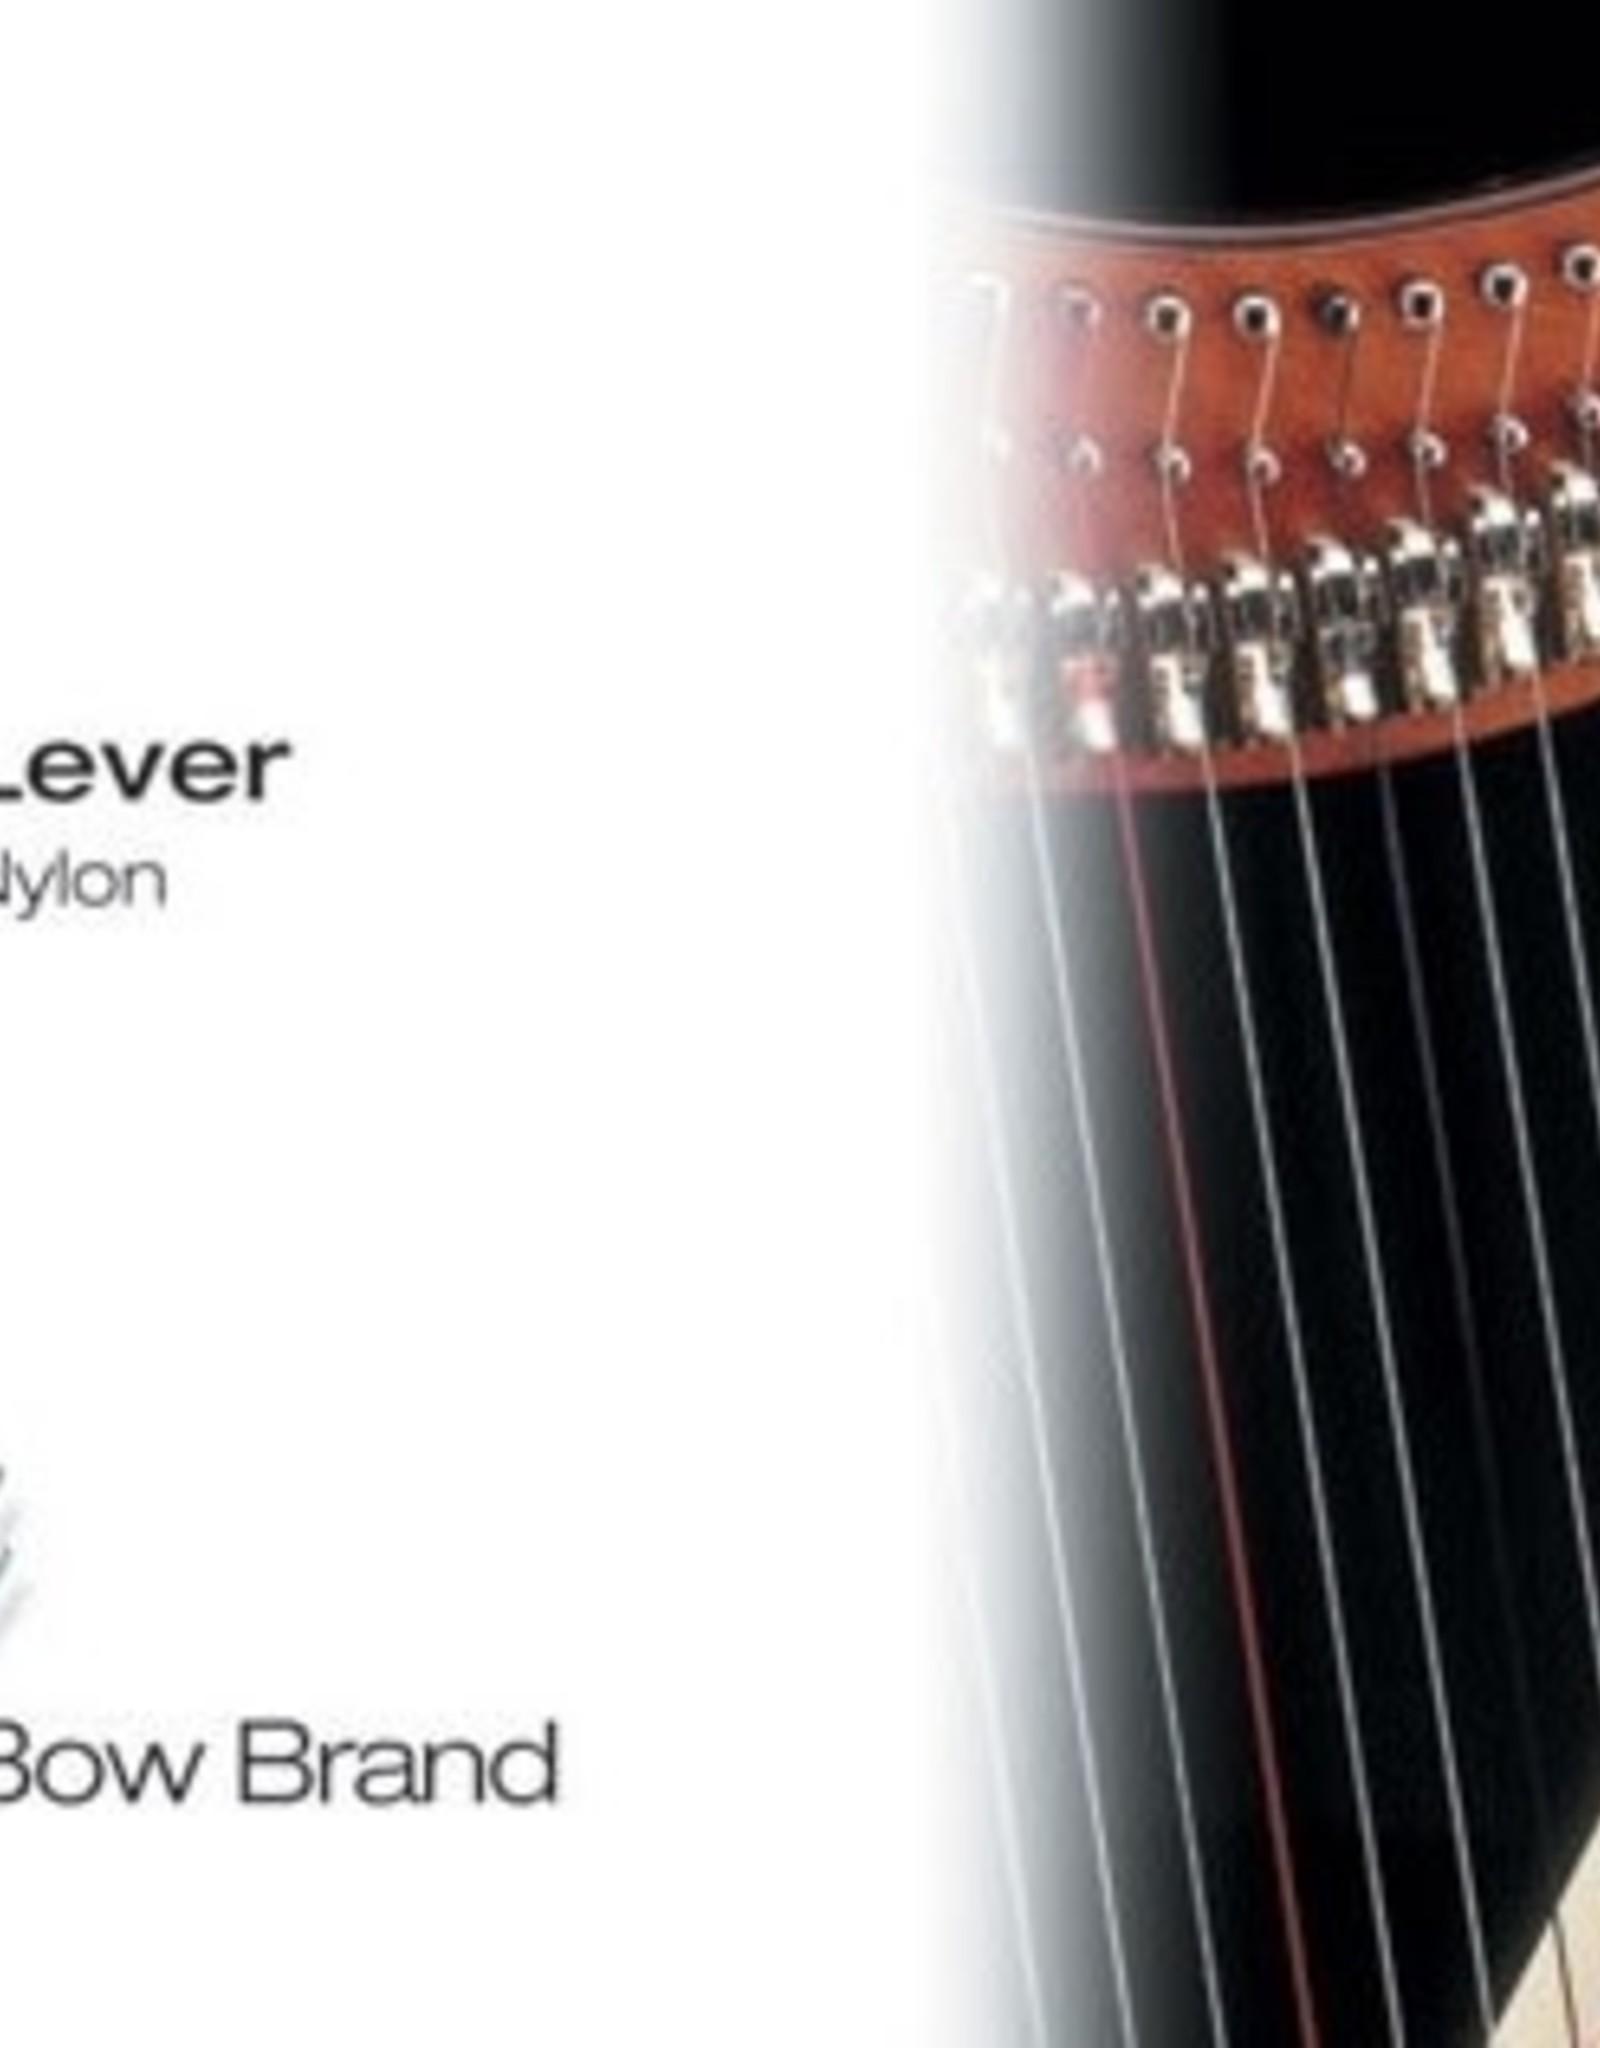 BOW BRAND  klep nylon - lever NYLON 23/4 re